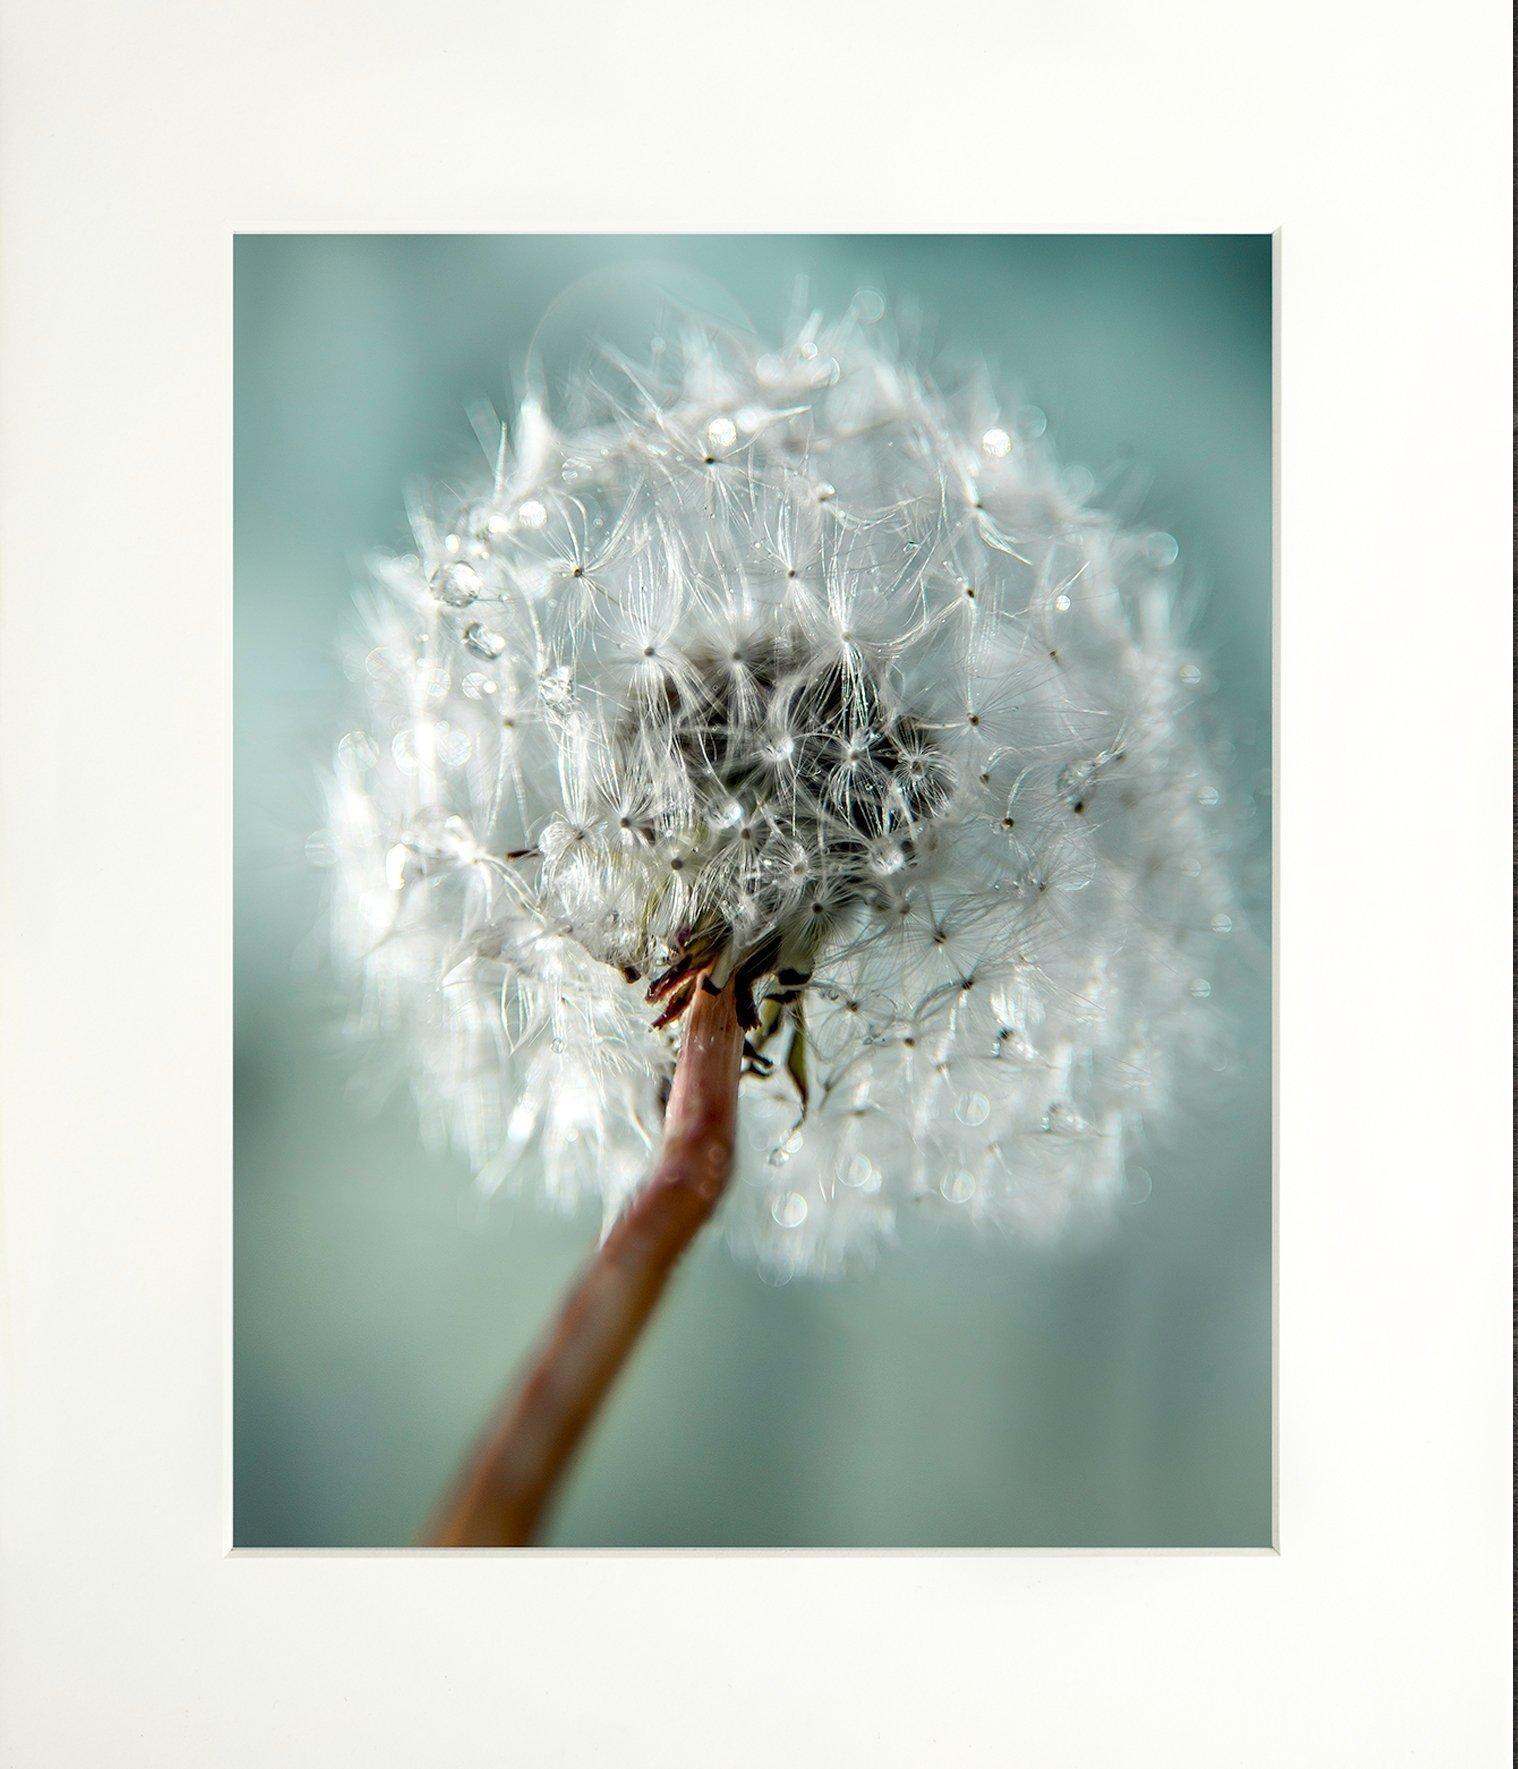 Dandelion, Cottage Decor, Rustic Wall Art, Canvas, Farm Art, Teal Fixer Upper, Floral Shabby, Bathroom, 8x10 print